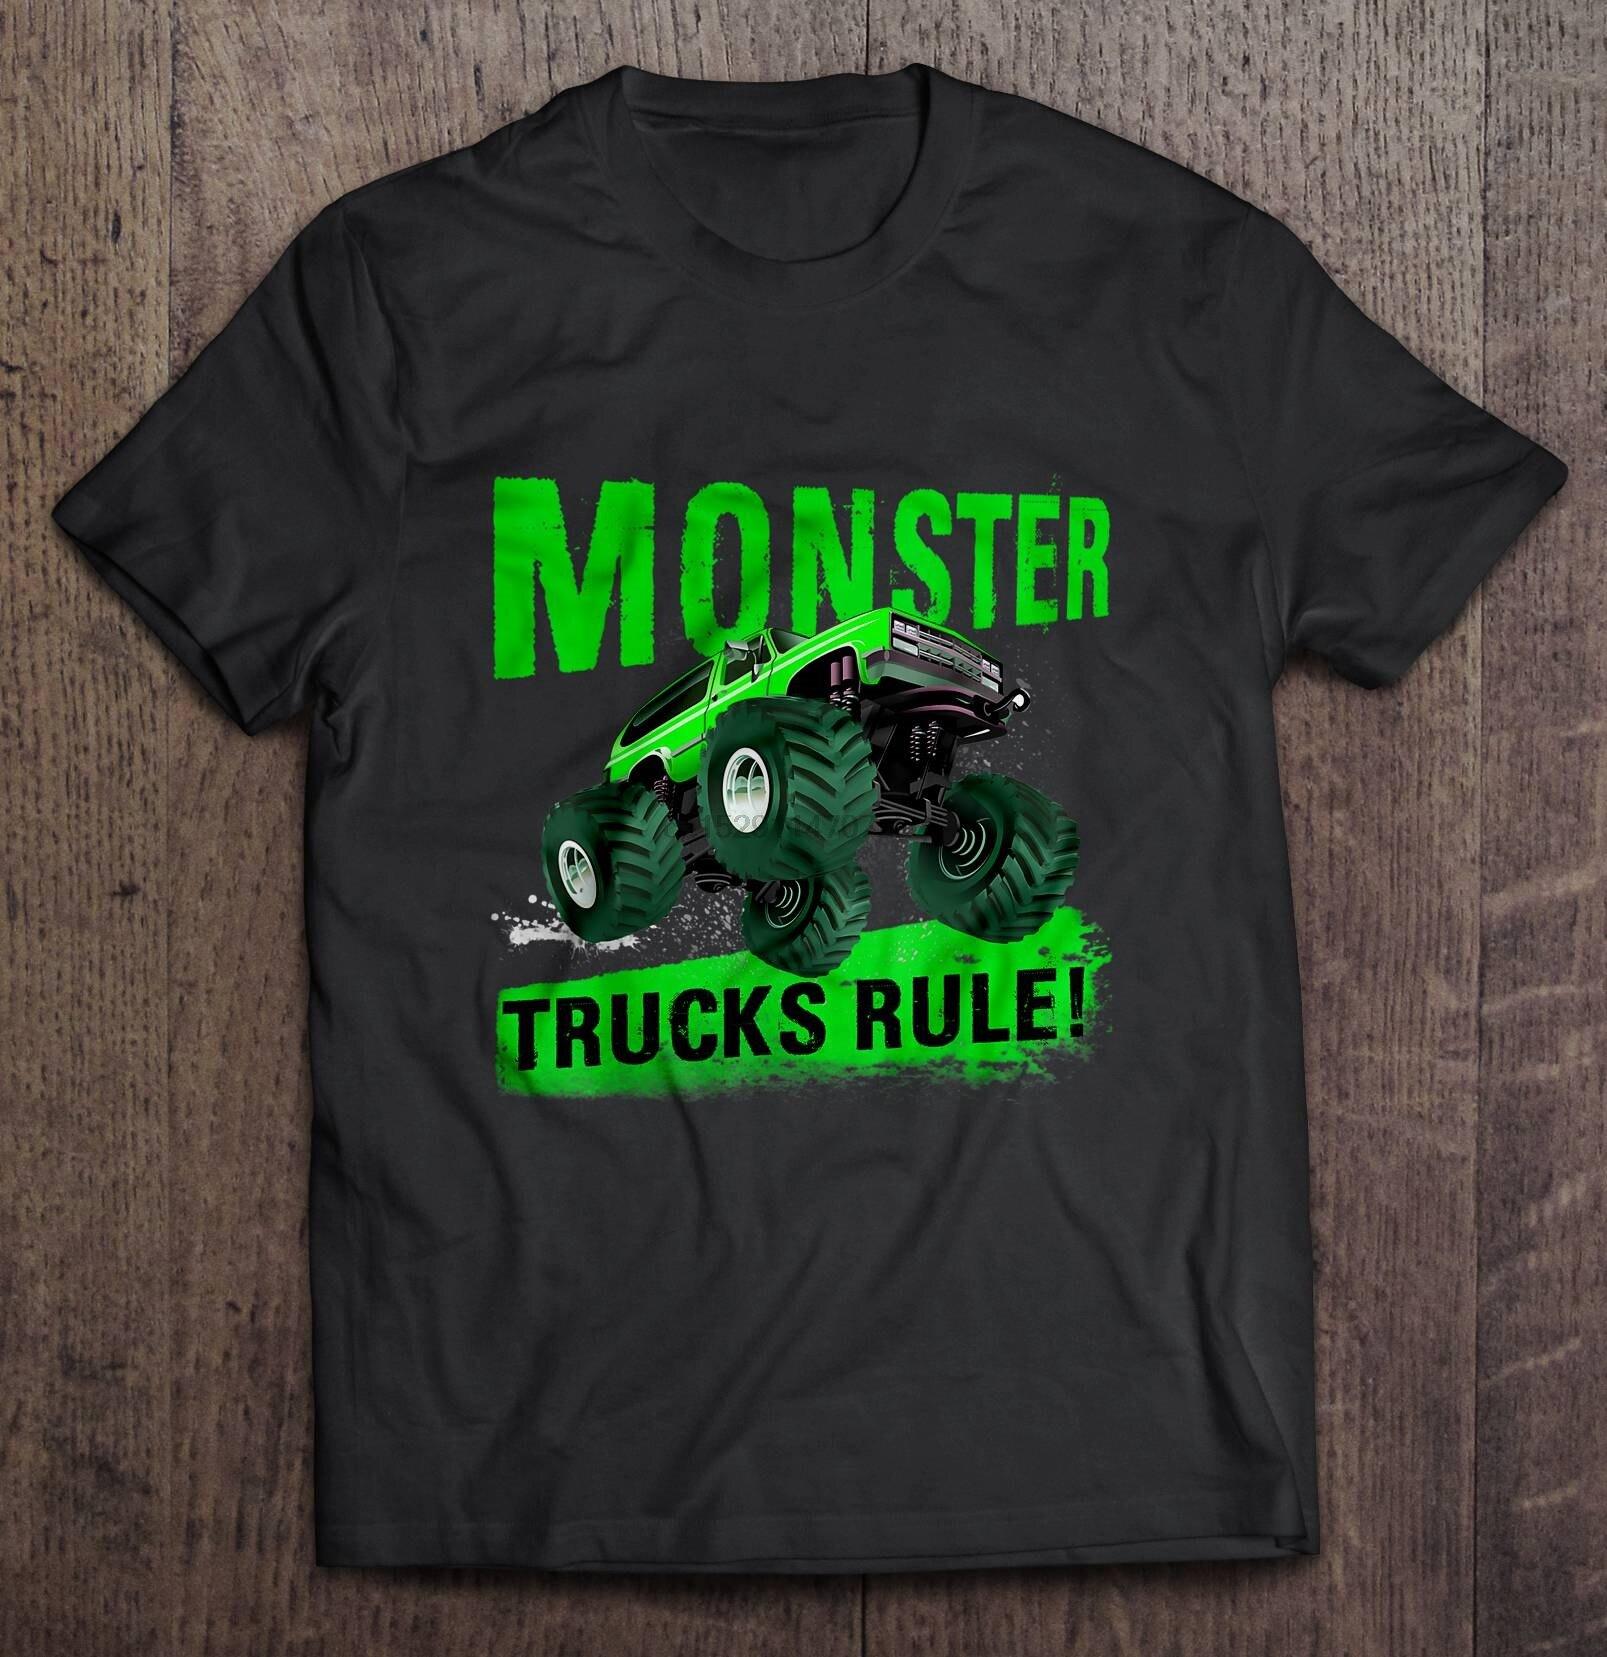 Camiseta masculina engraçado t camisa moda camiseta monster trucks rule version2